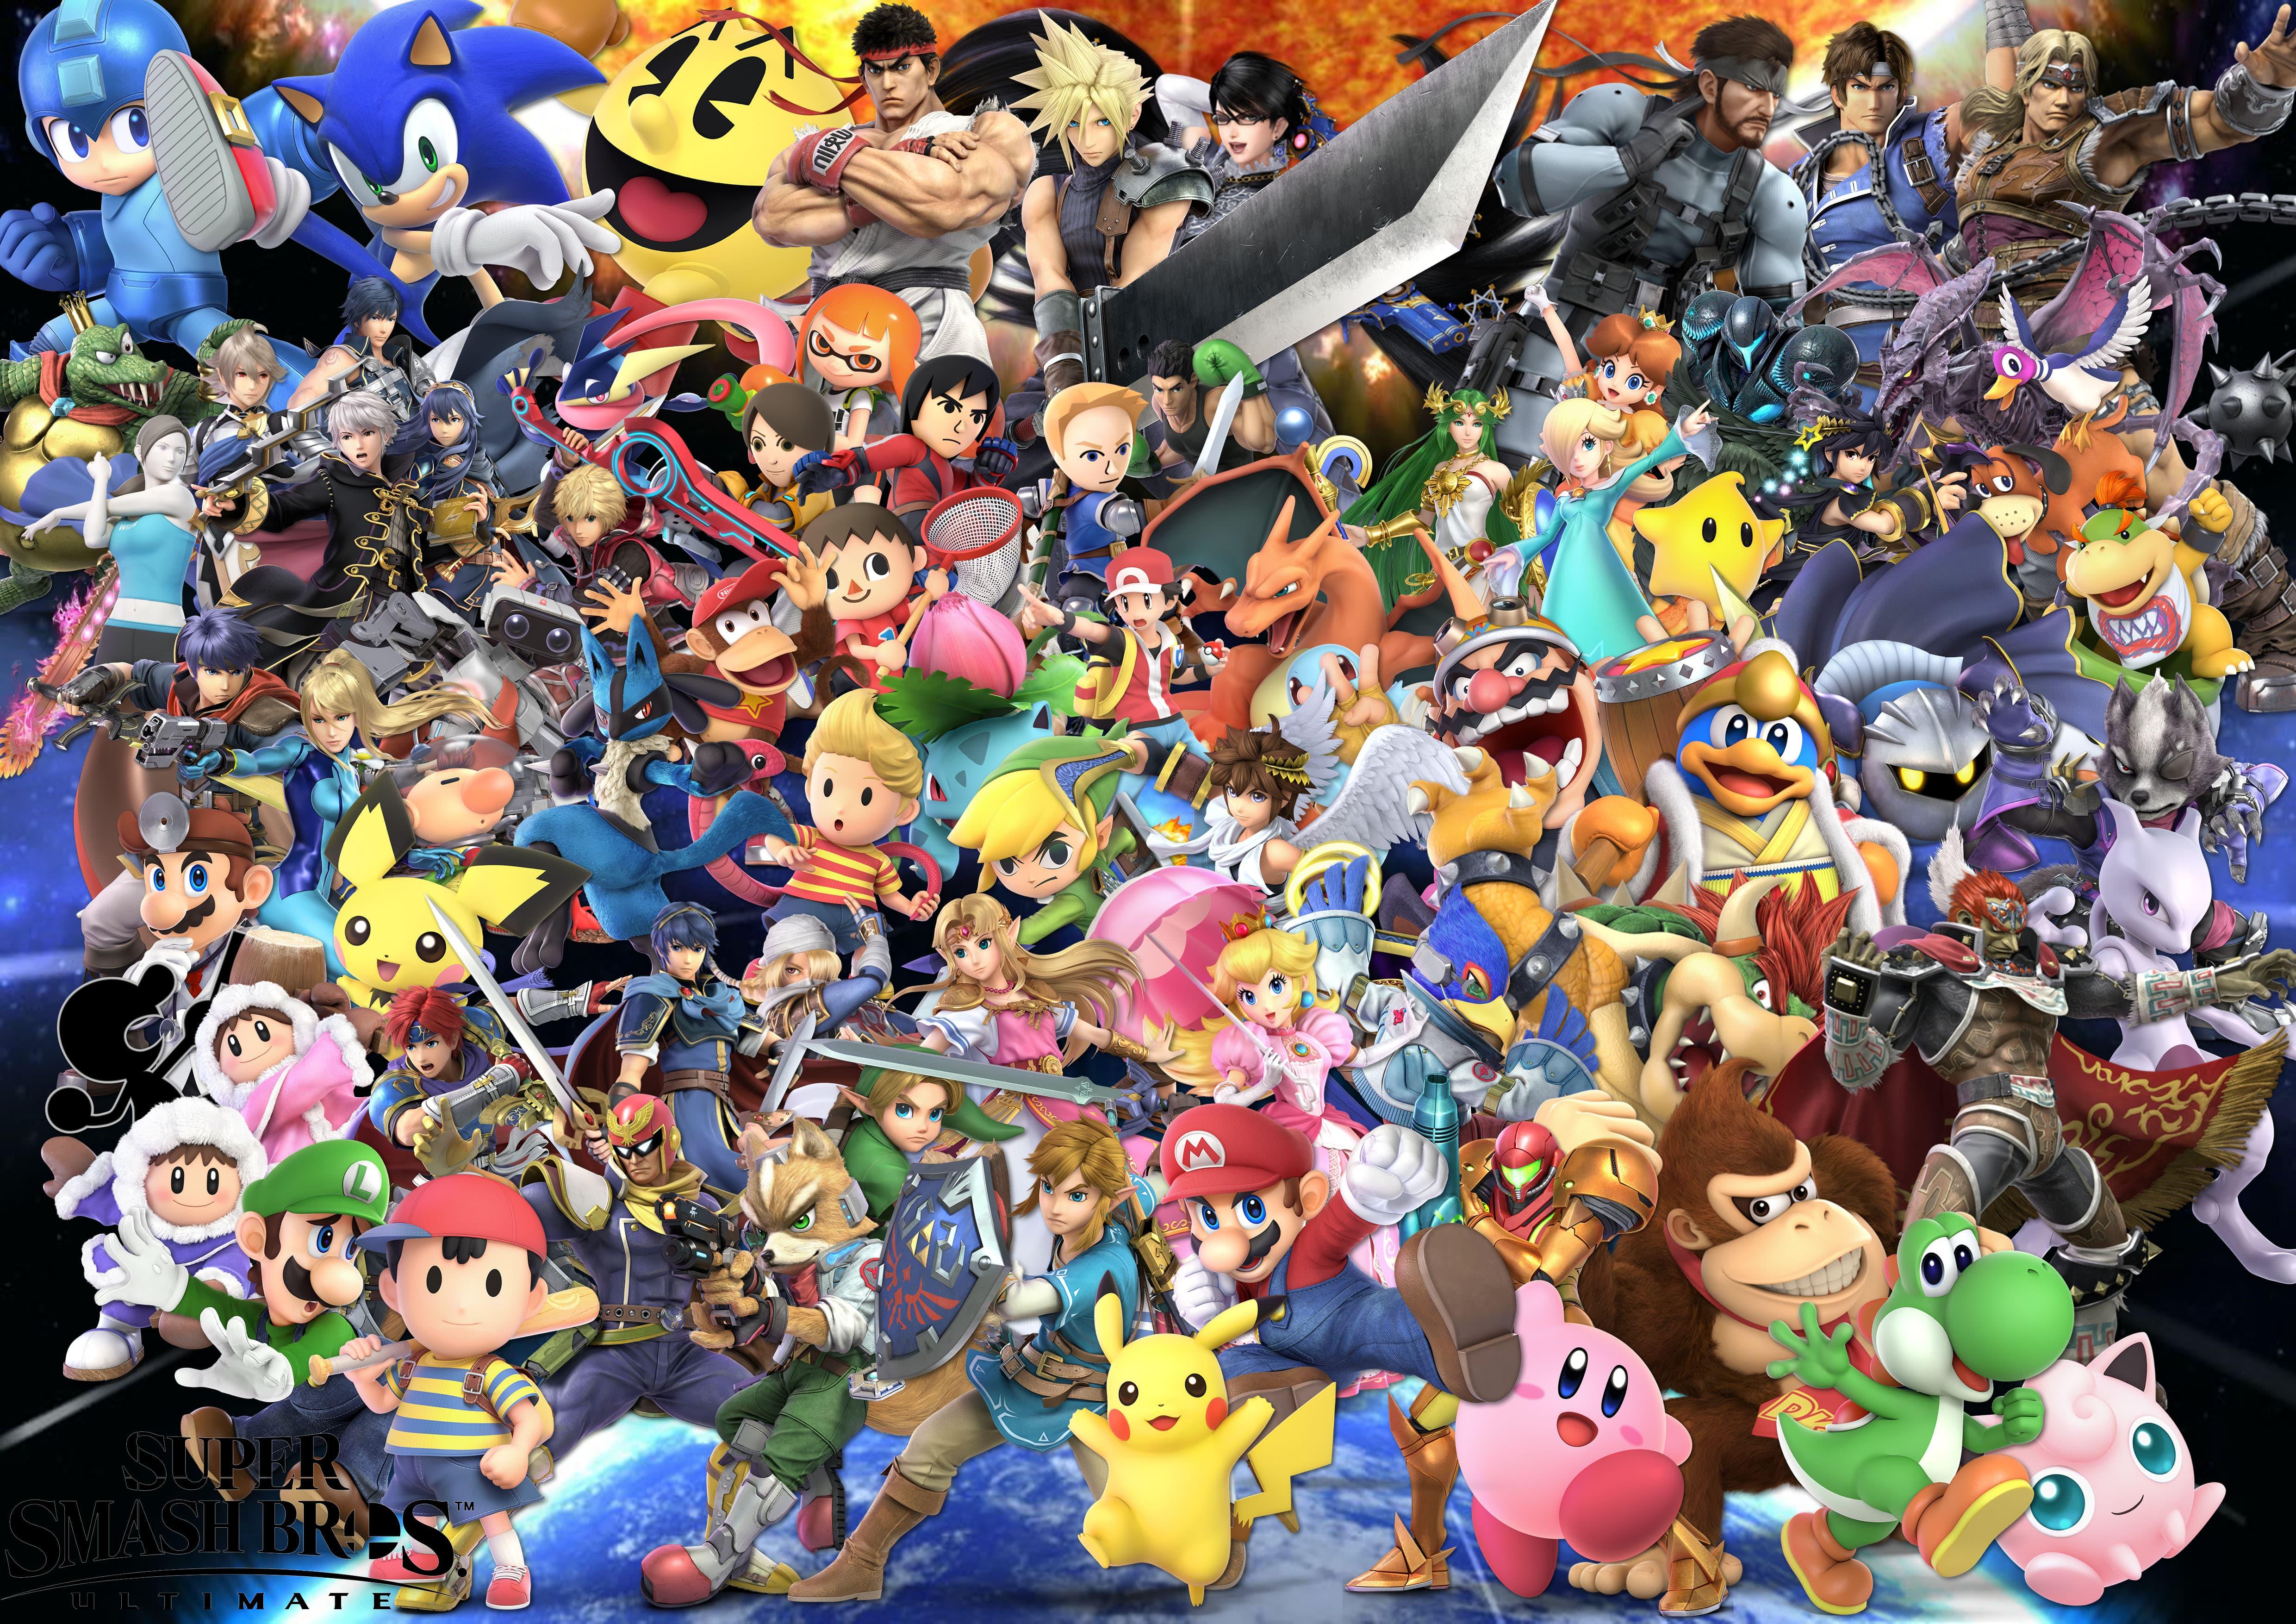 [45+] Smash Bros Ultimate Wallpapers on WallpaperSafari